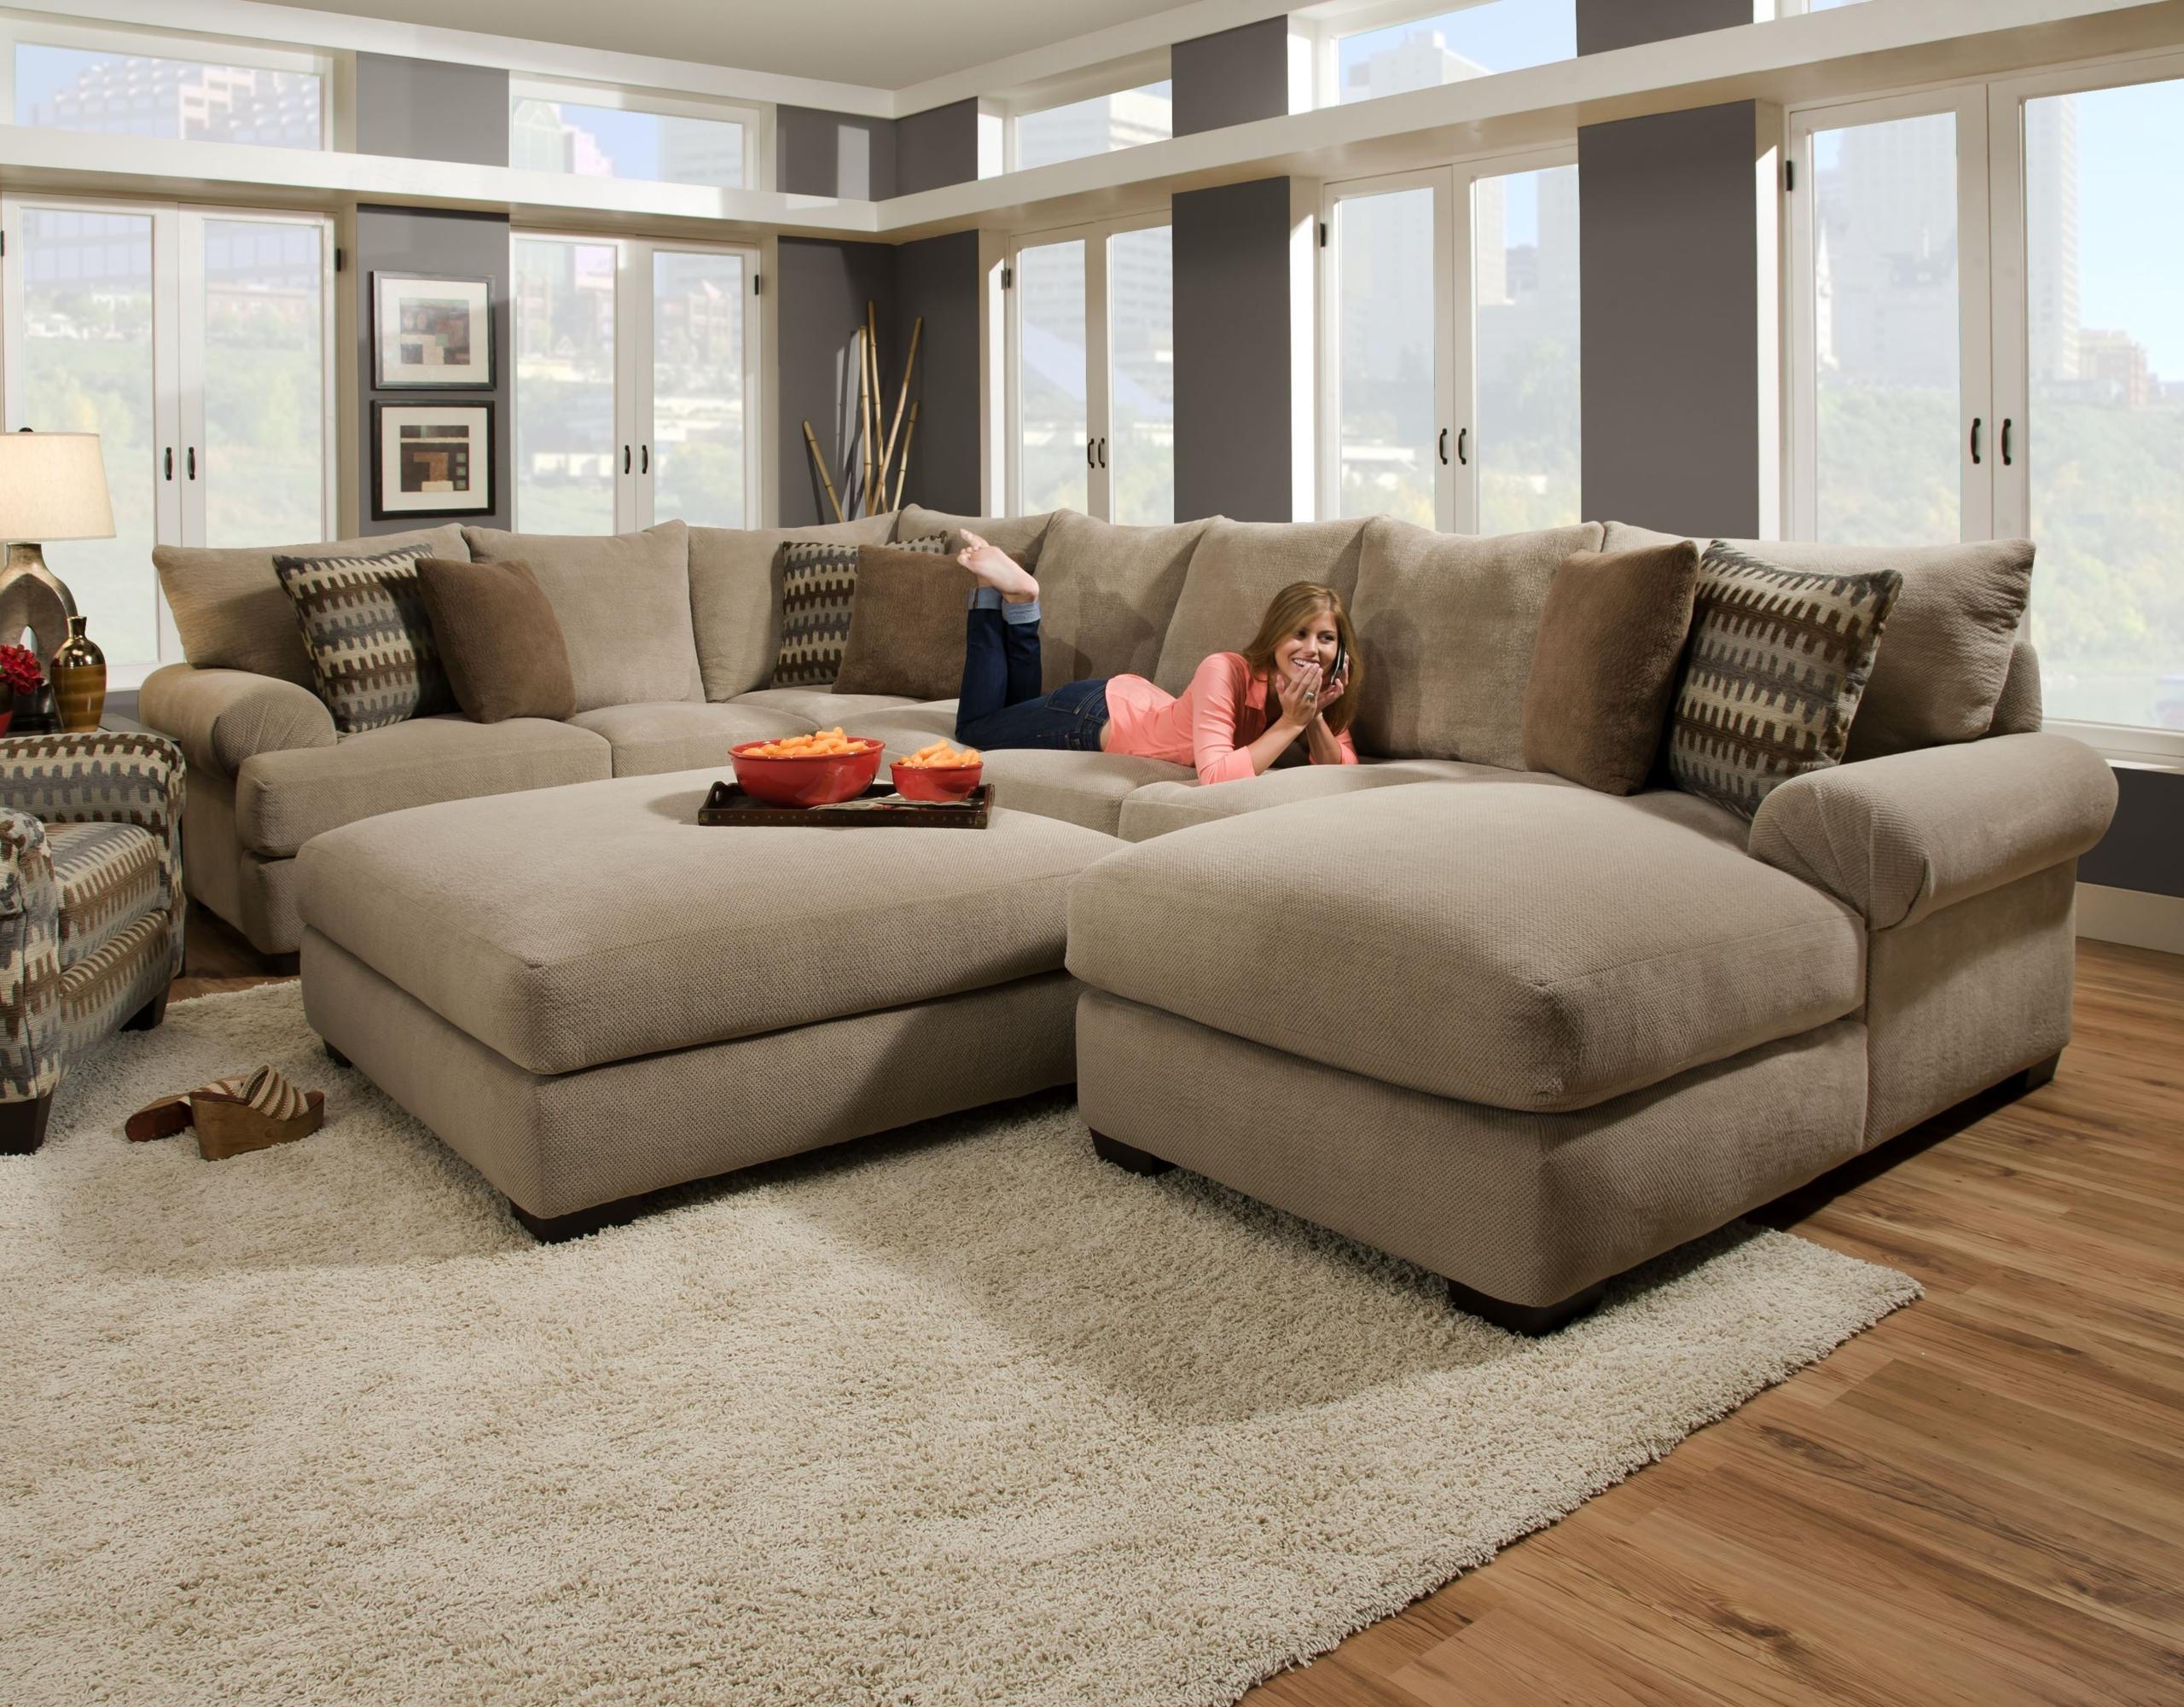 extra large sectional sofa visual hunt rh visualhunt com large sectional sofas canada large sectional sofas big lots